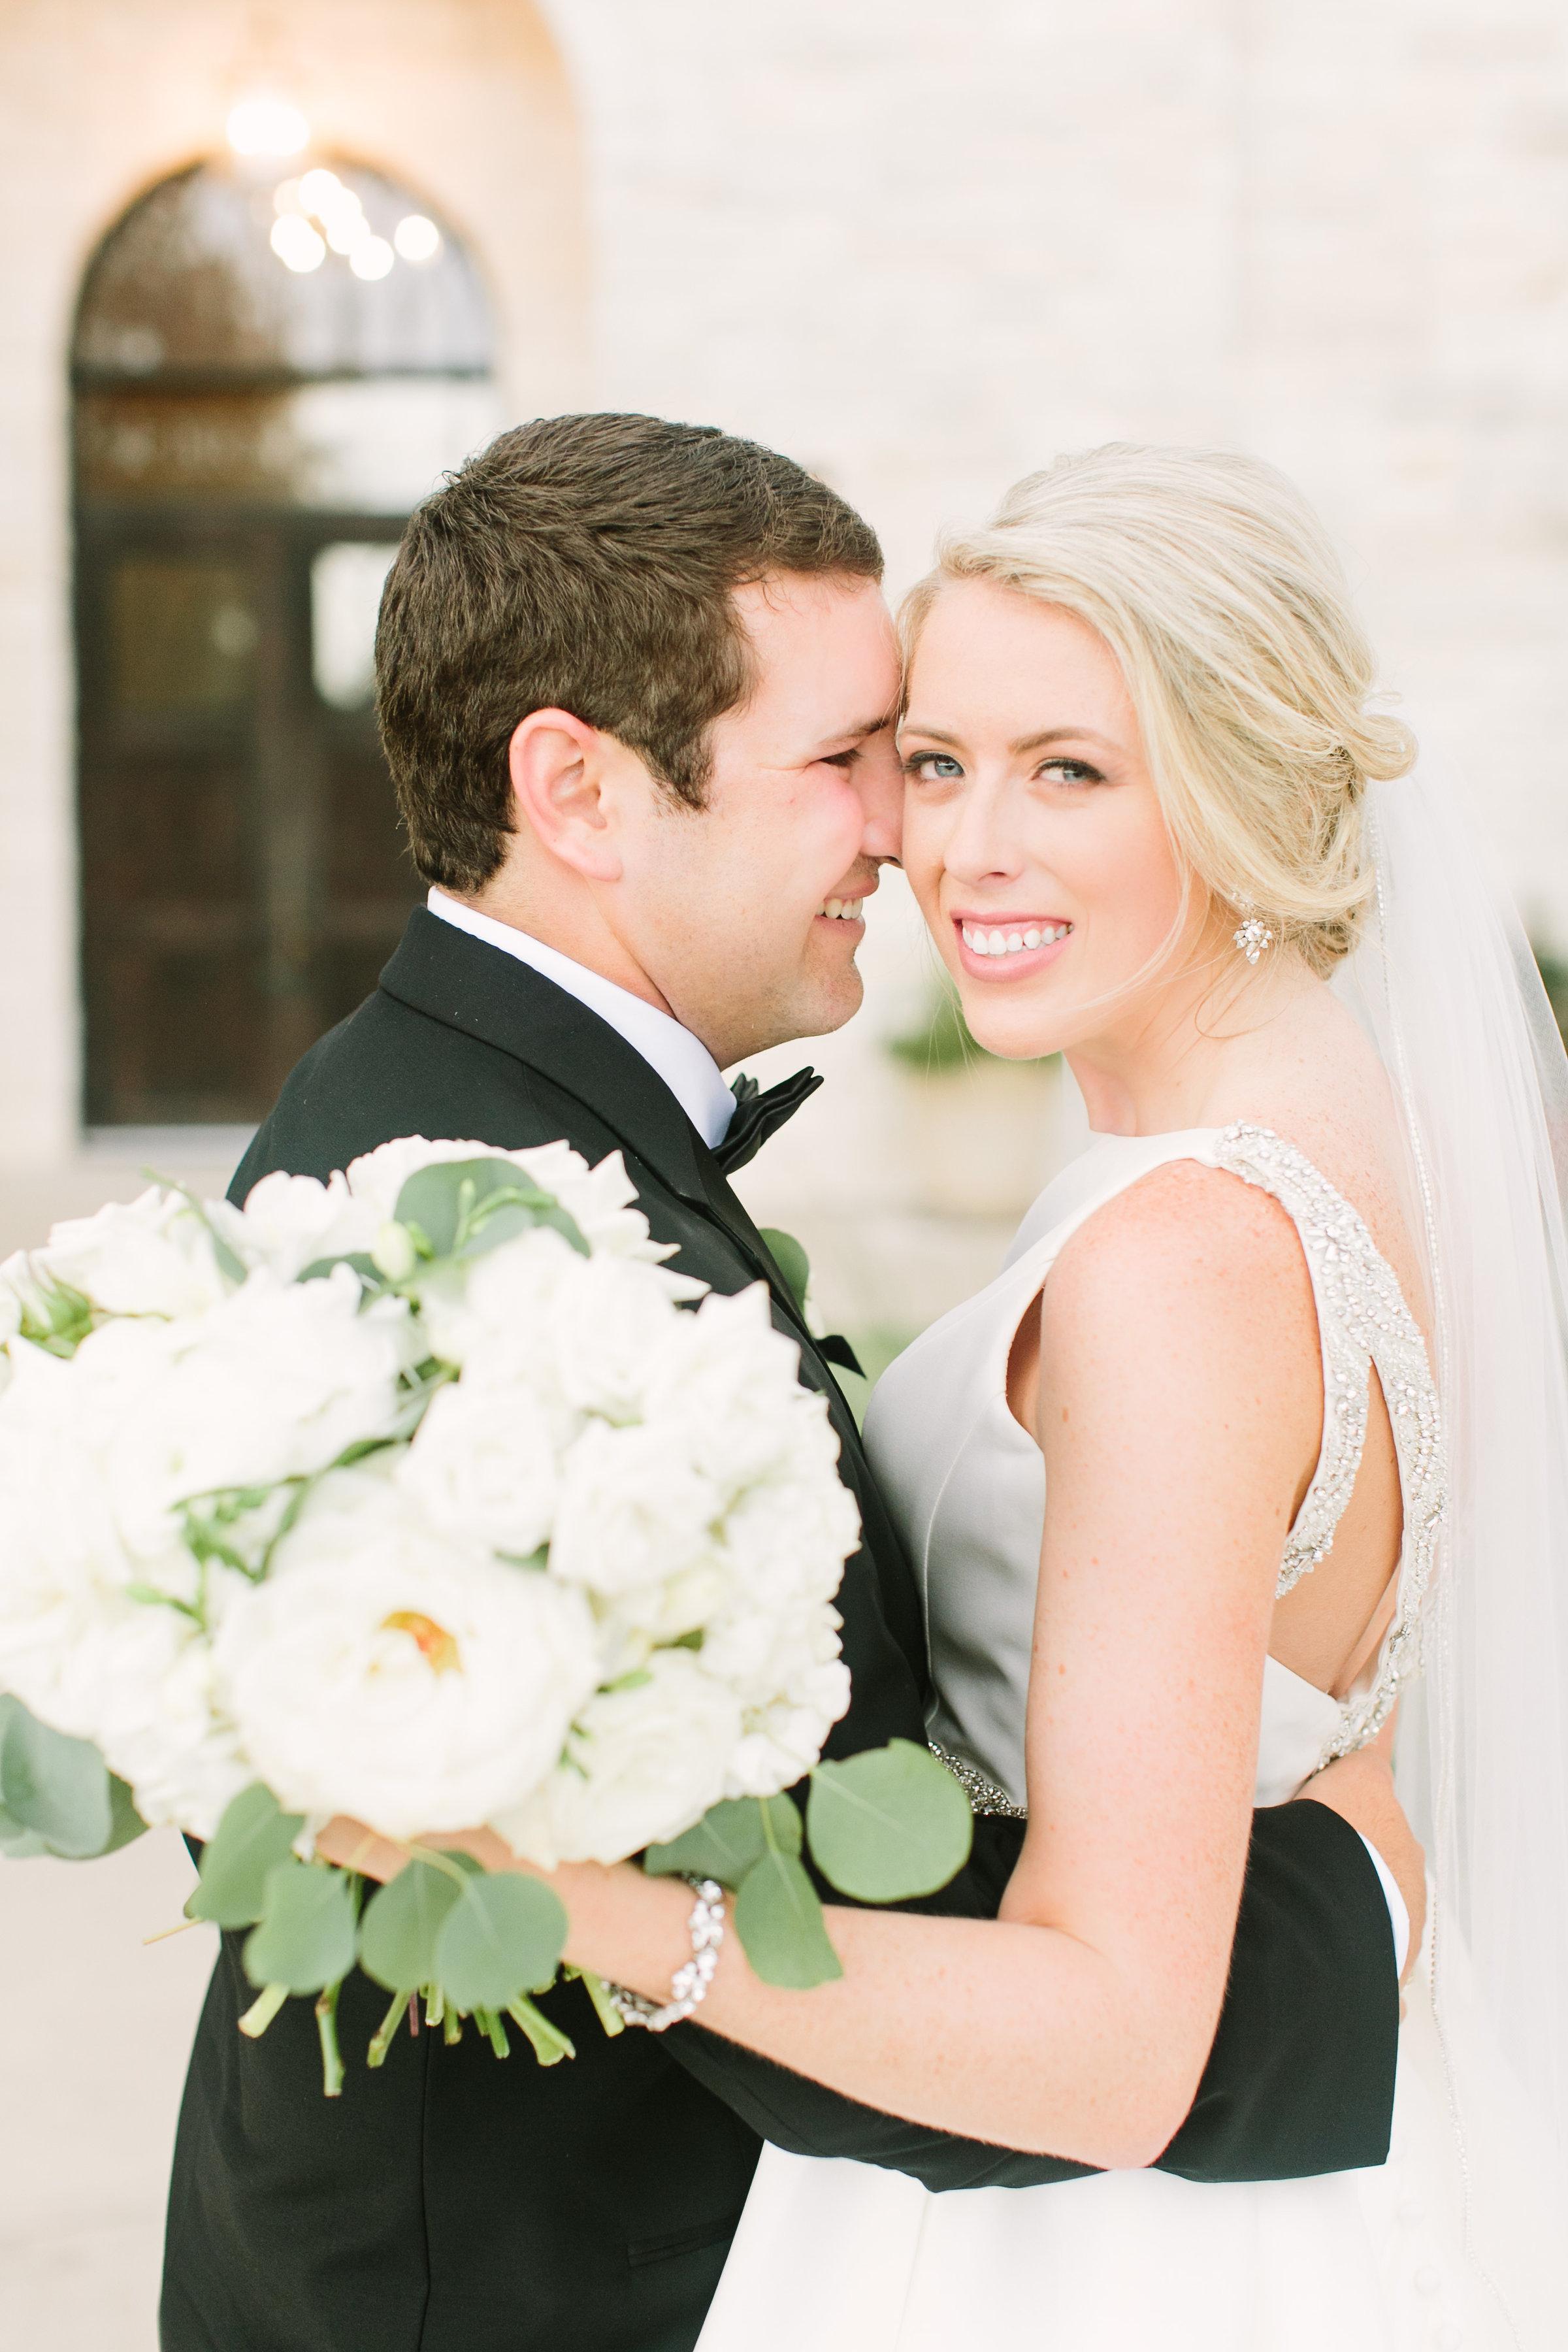 bride-groom-wedding-white-bouquet-full-by-maxit-flower-design-in-houston-texas